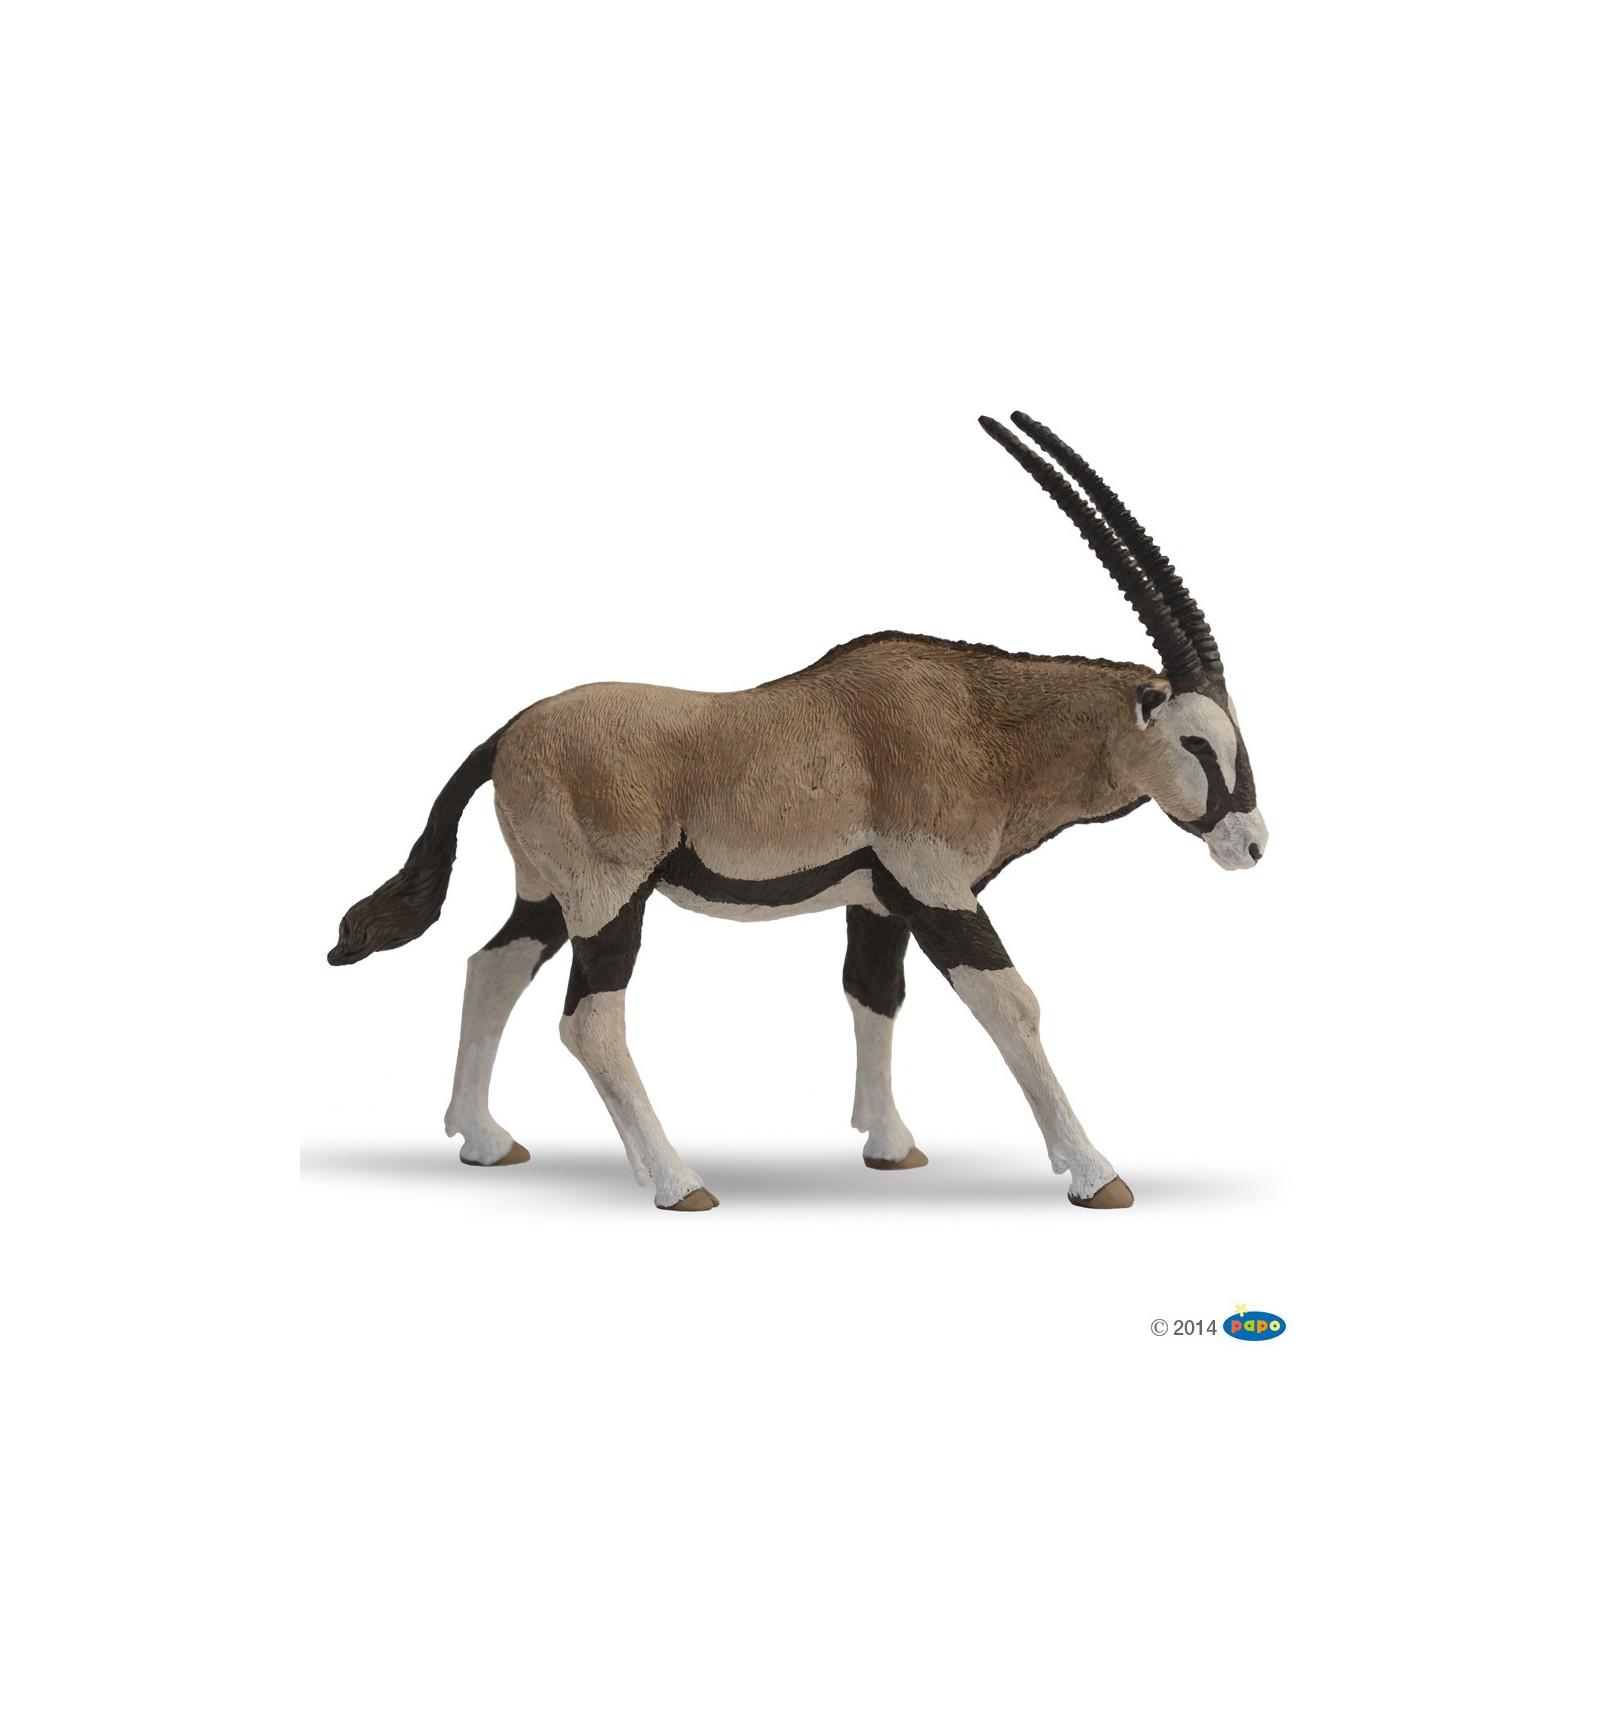 Oryx Antelope Papo